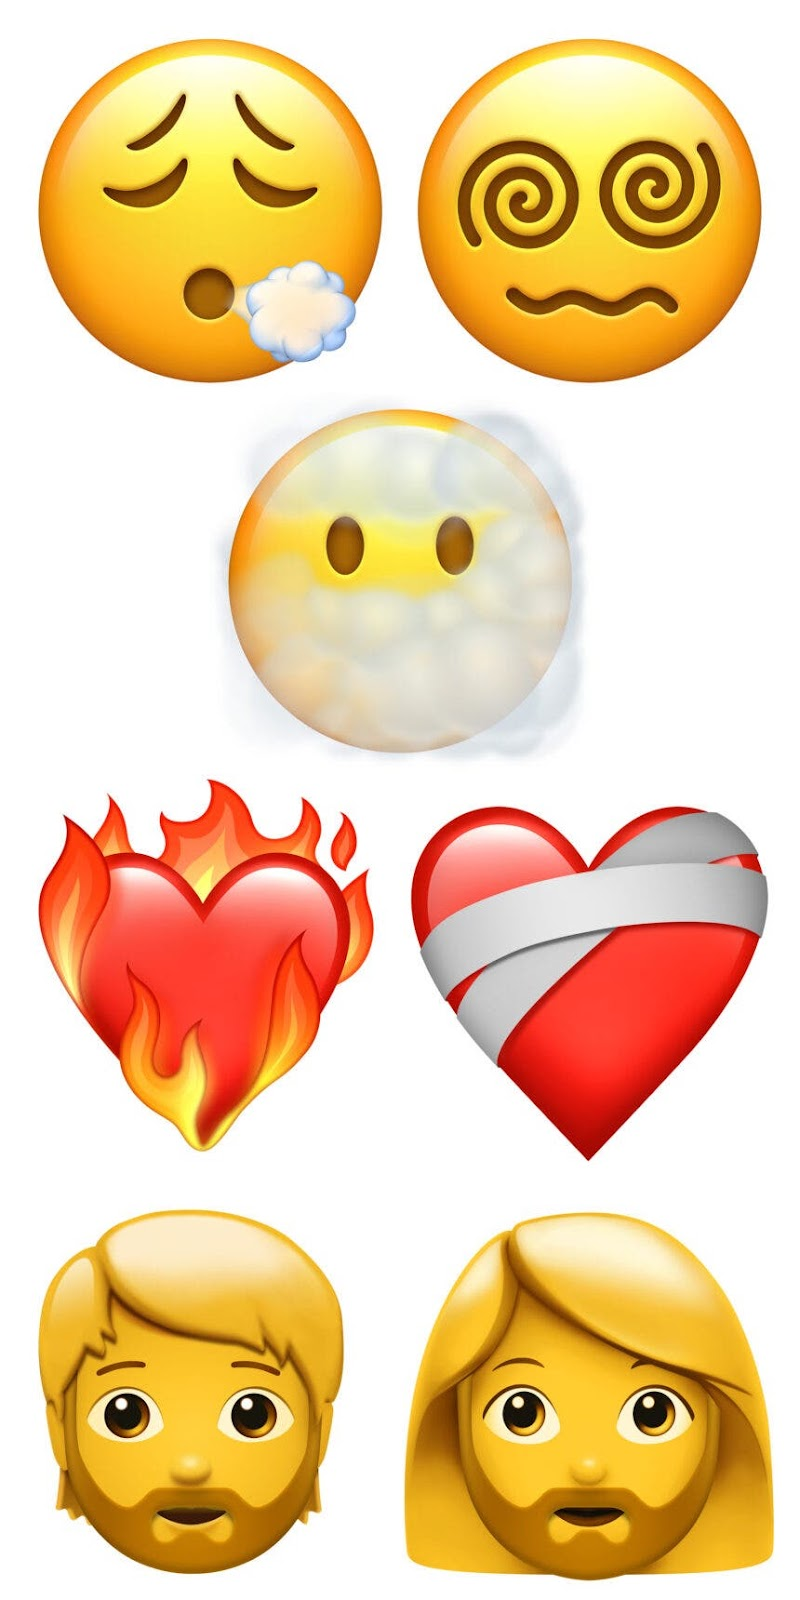 Apple emojis nuevos 2021 iOS 14.5